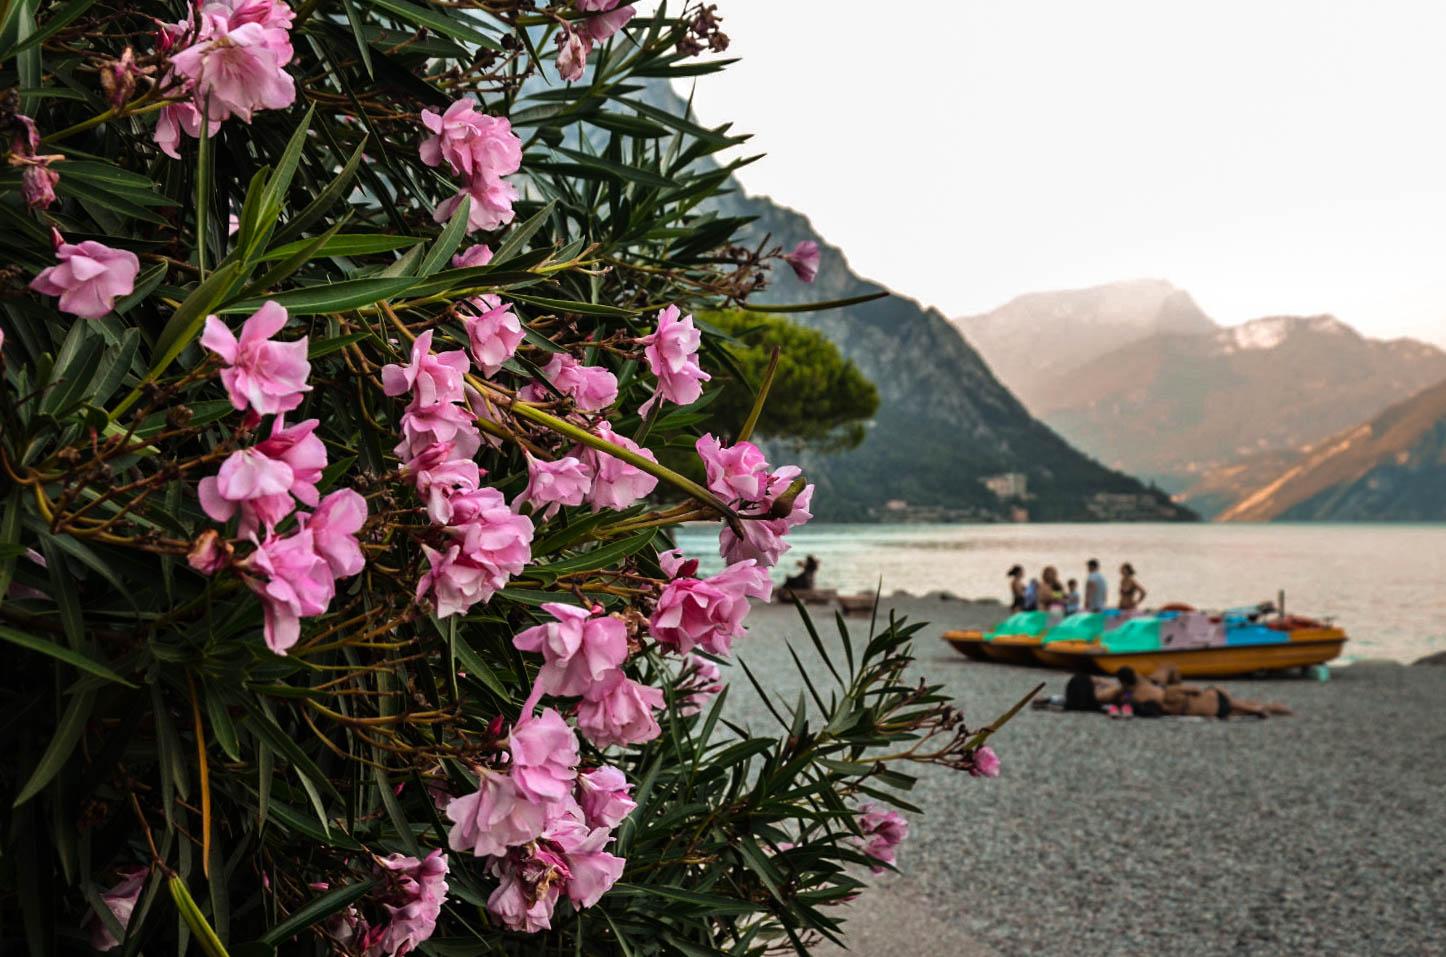 Limone sul Garda, Lake Garda